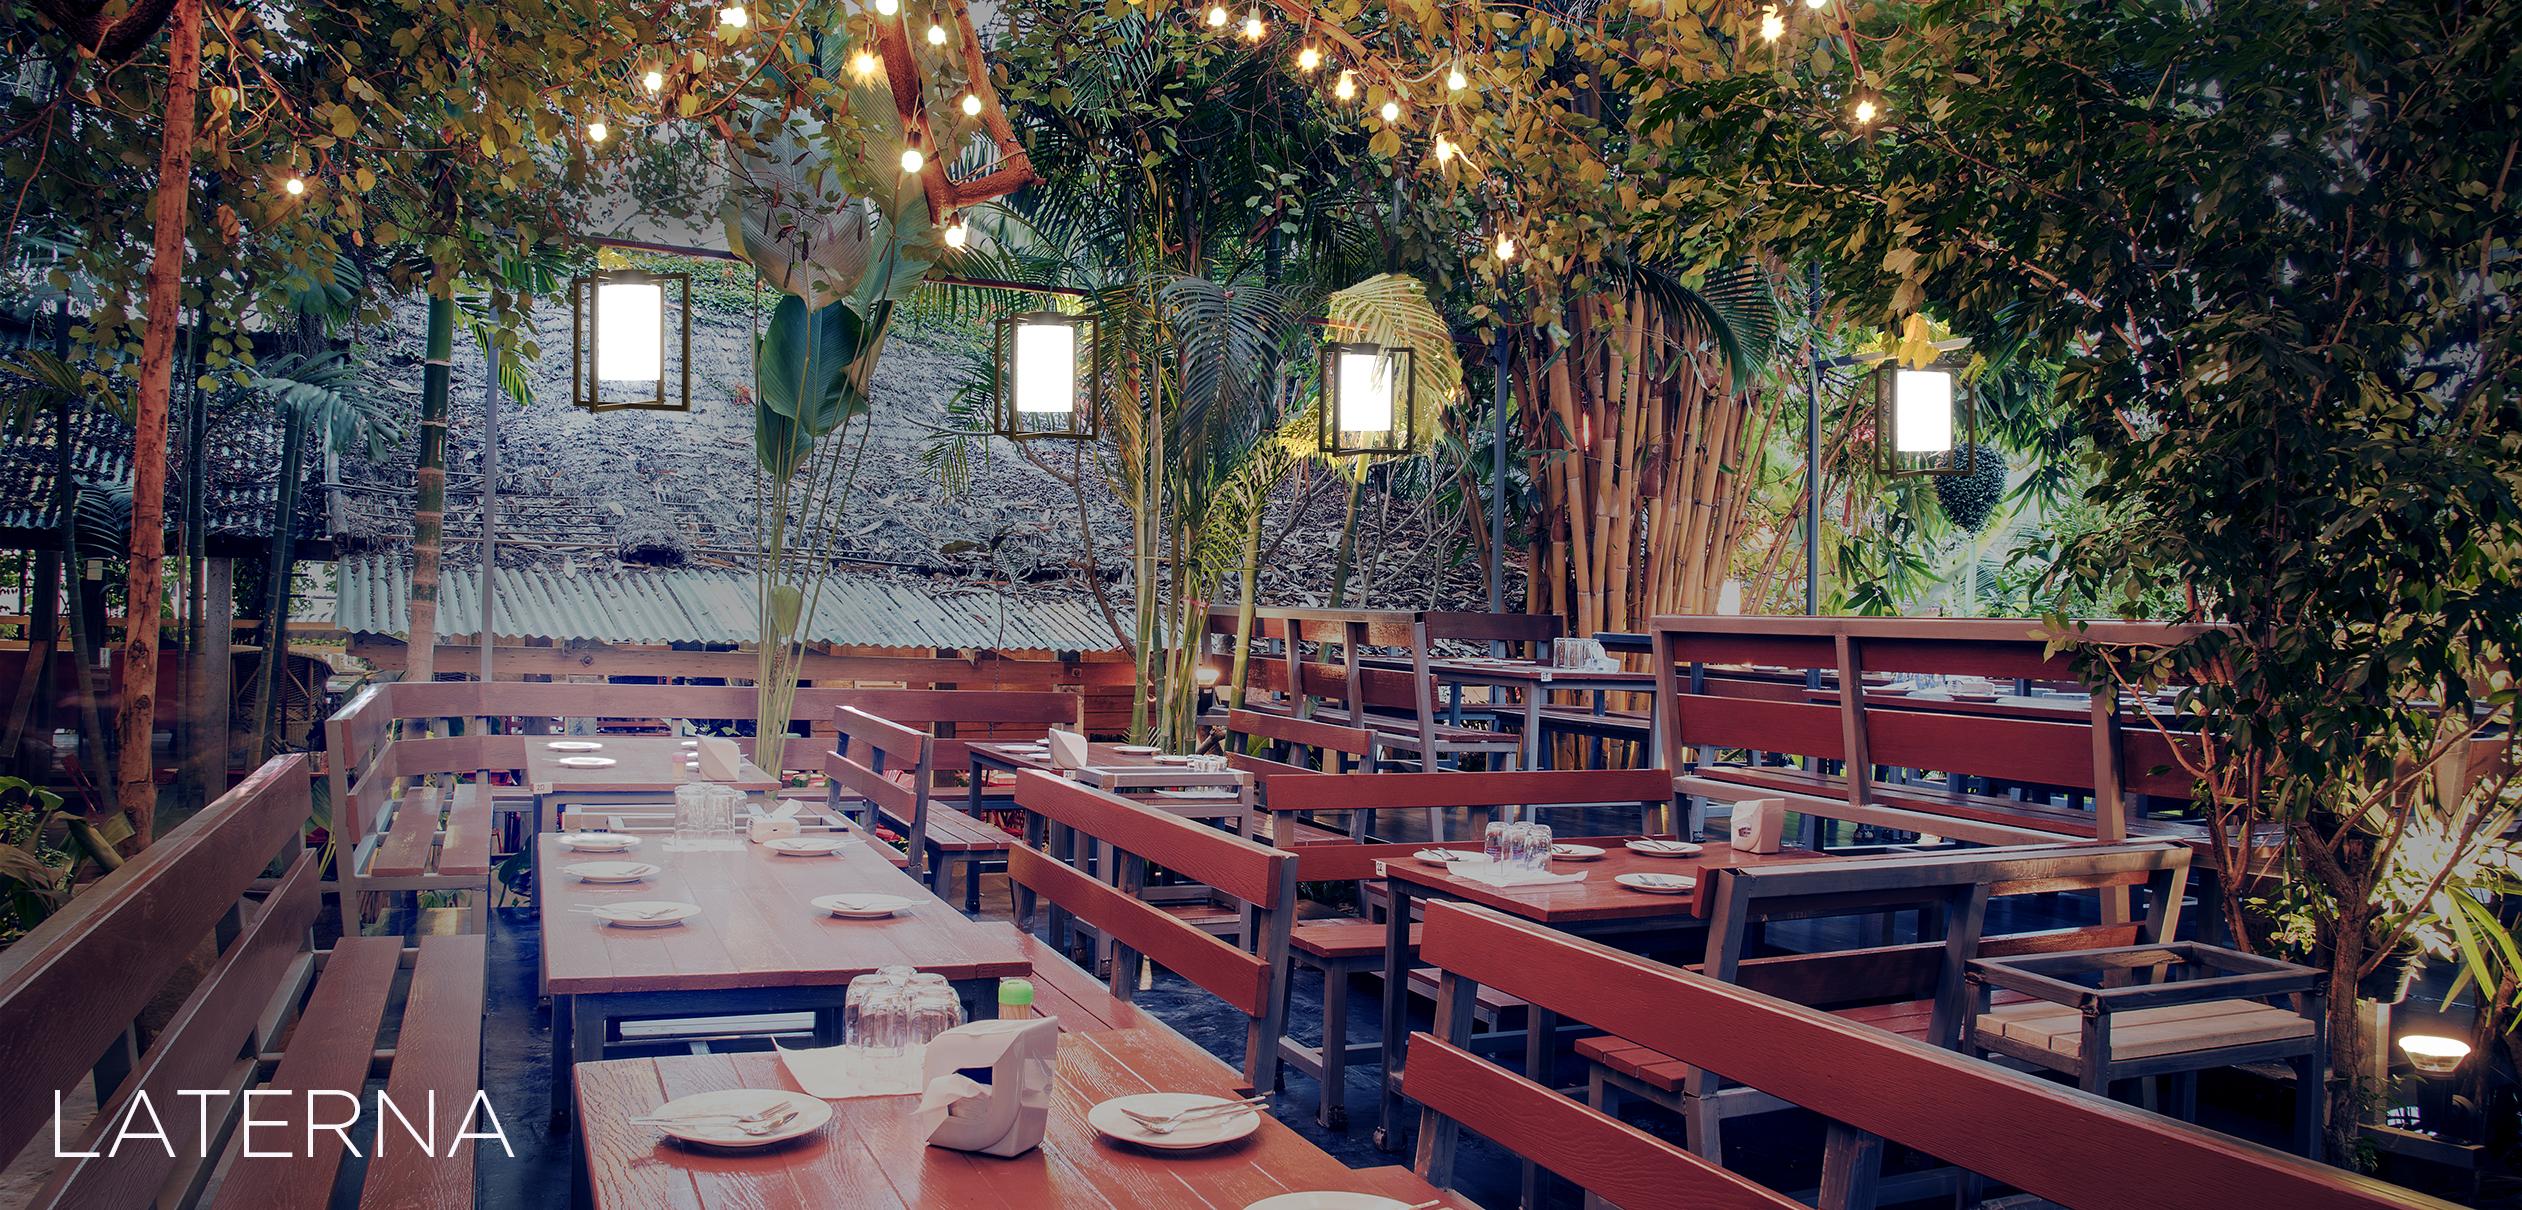 Laterna catenary lantern pendants in an outdoor dining area